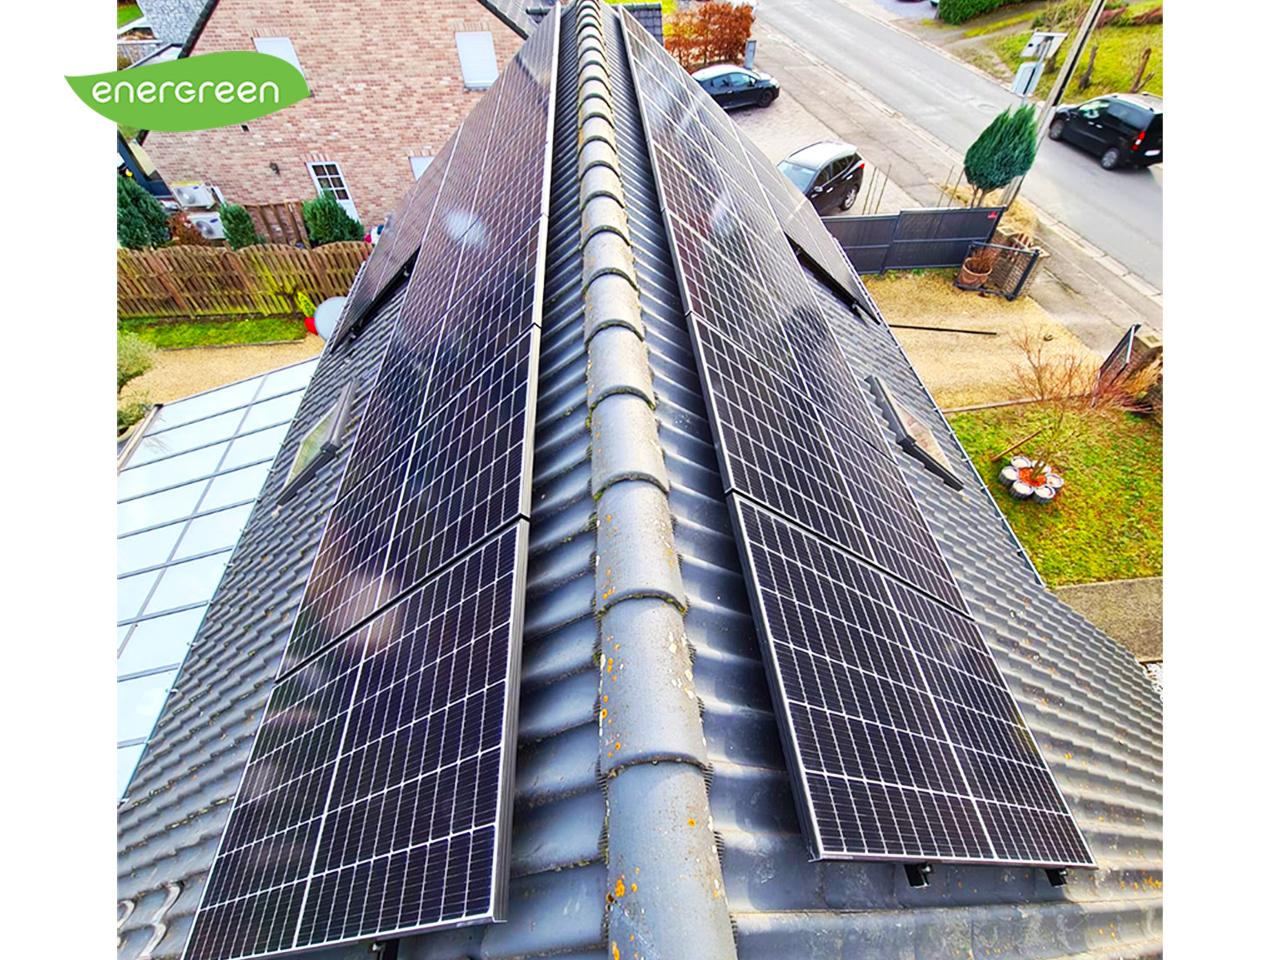 Installation panneaux photovoltaïques Trinasolar 370W Label EU15 Energreen